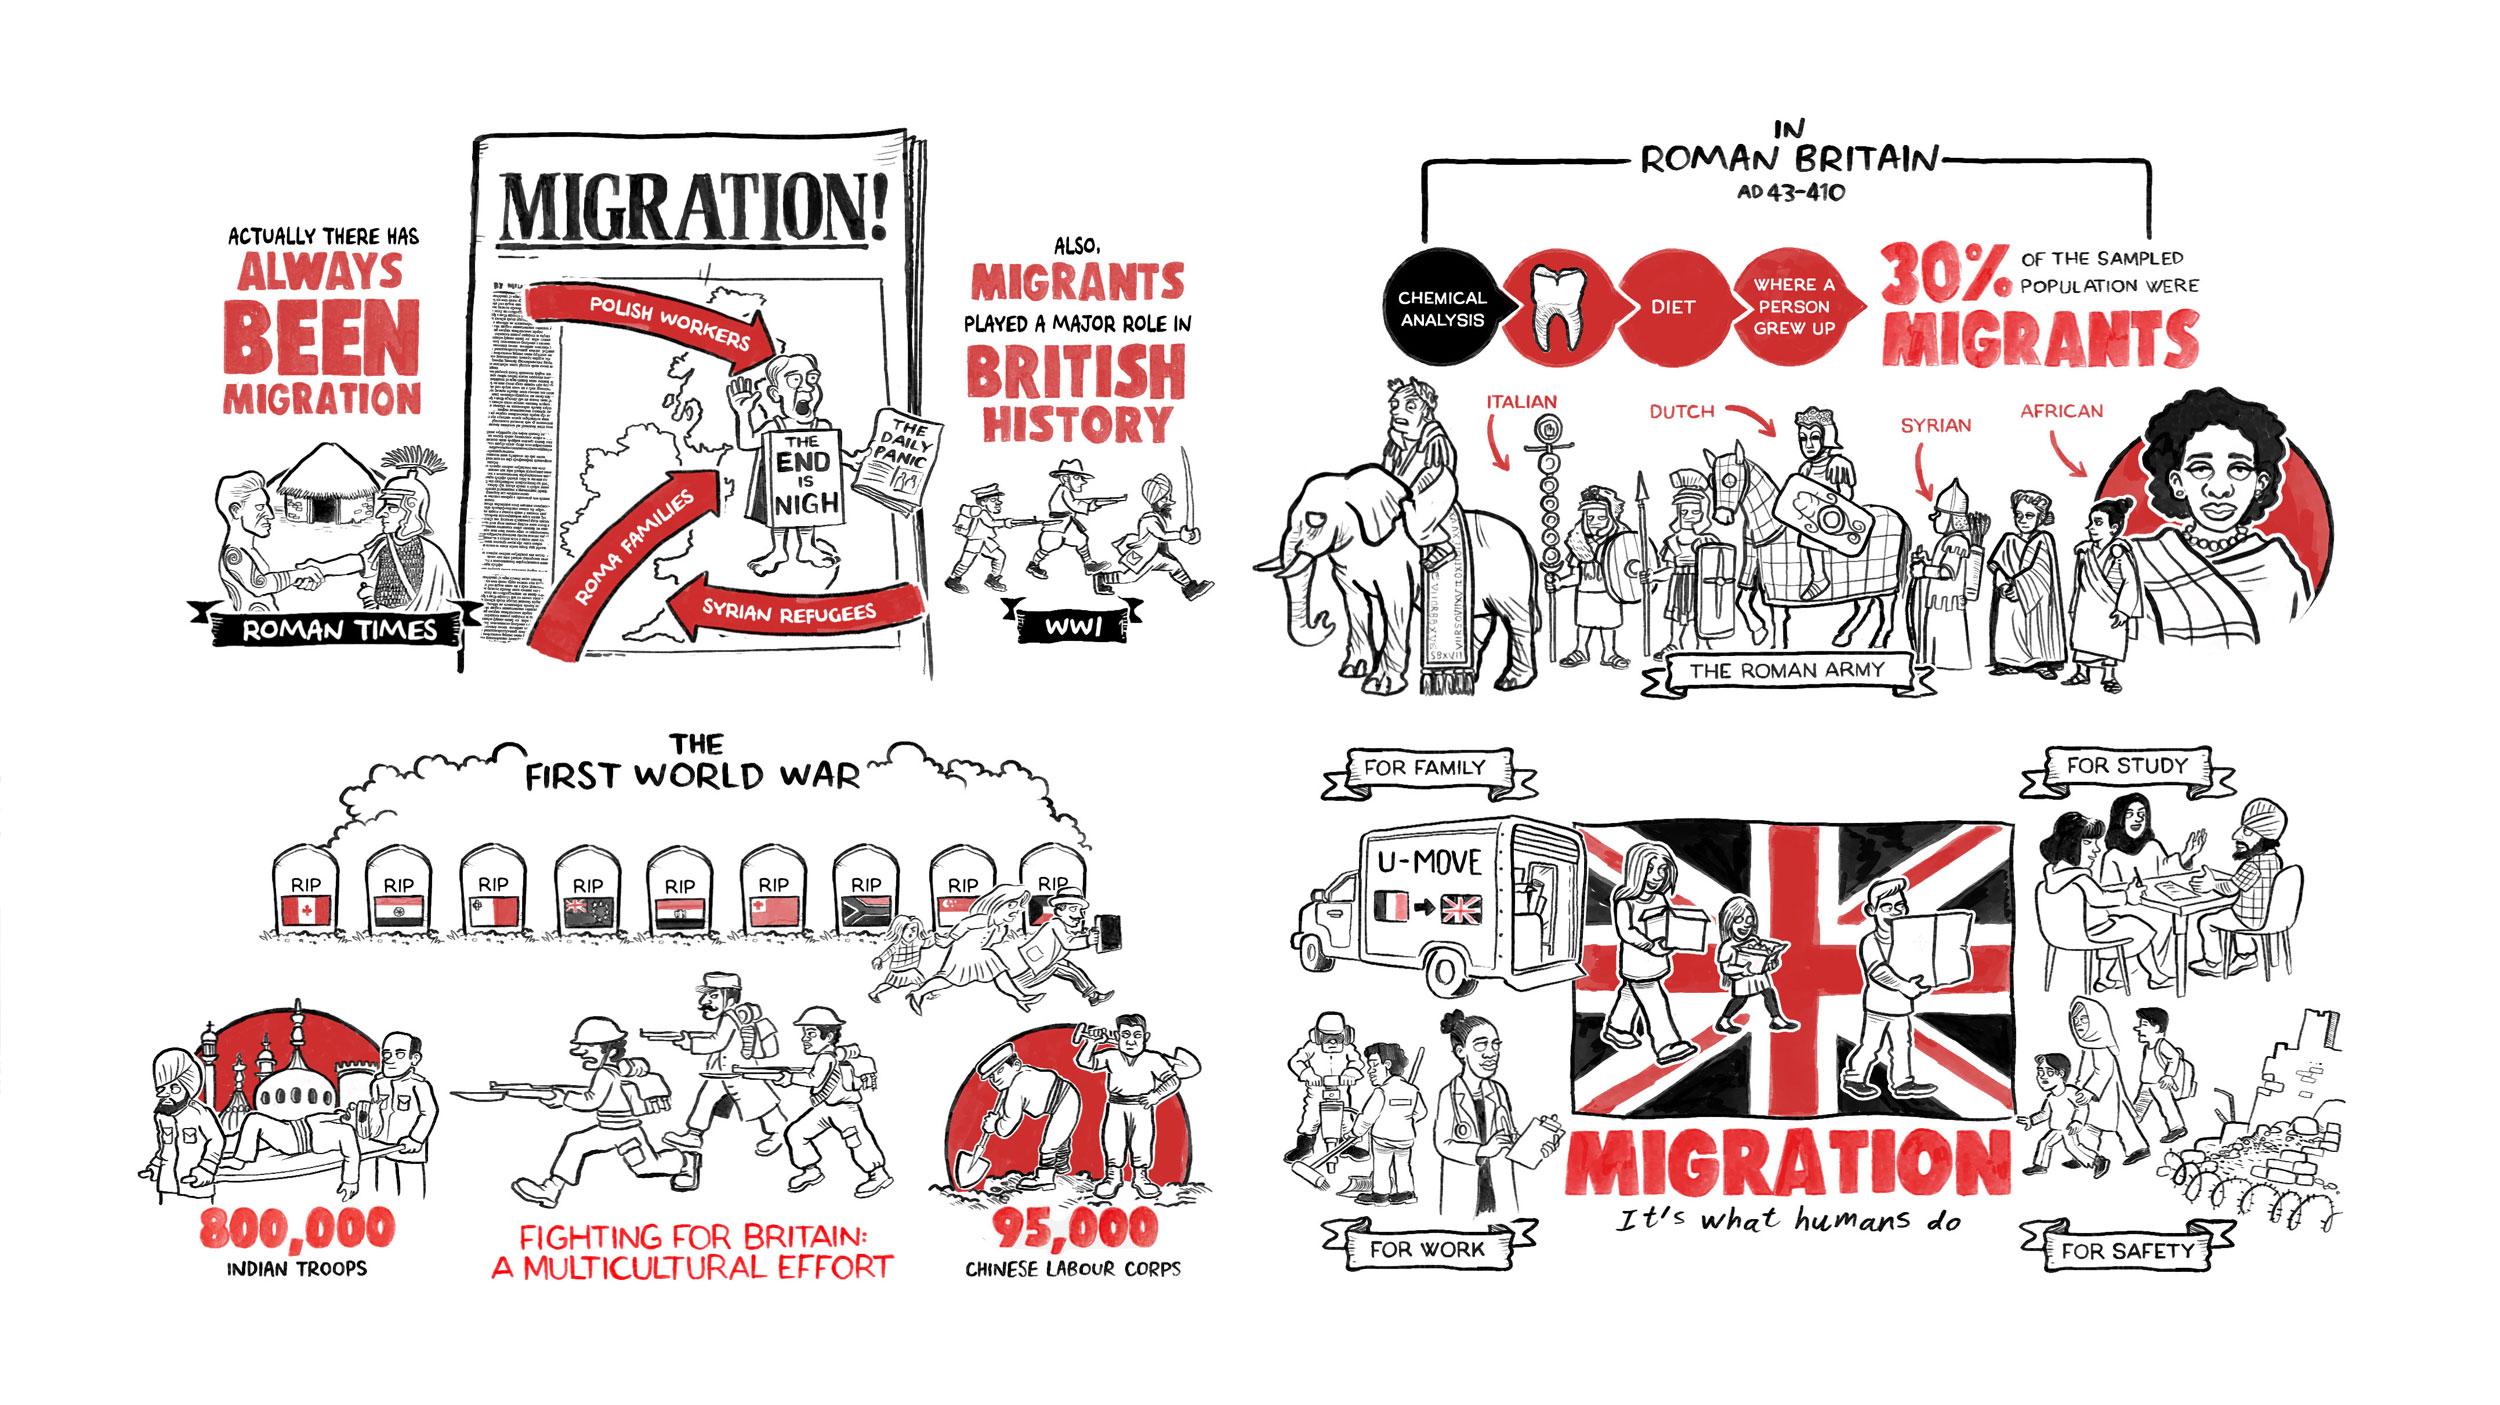 univeristy-of-kent-and-reading-migration-cognitive-08.jpg